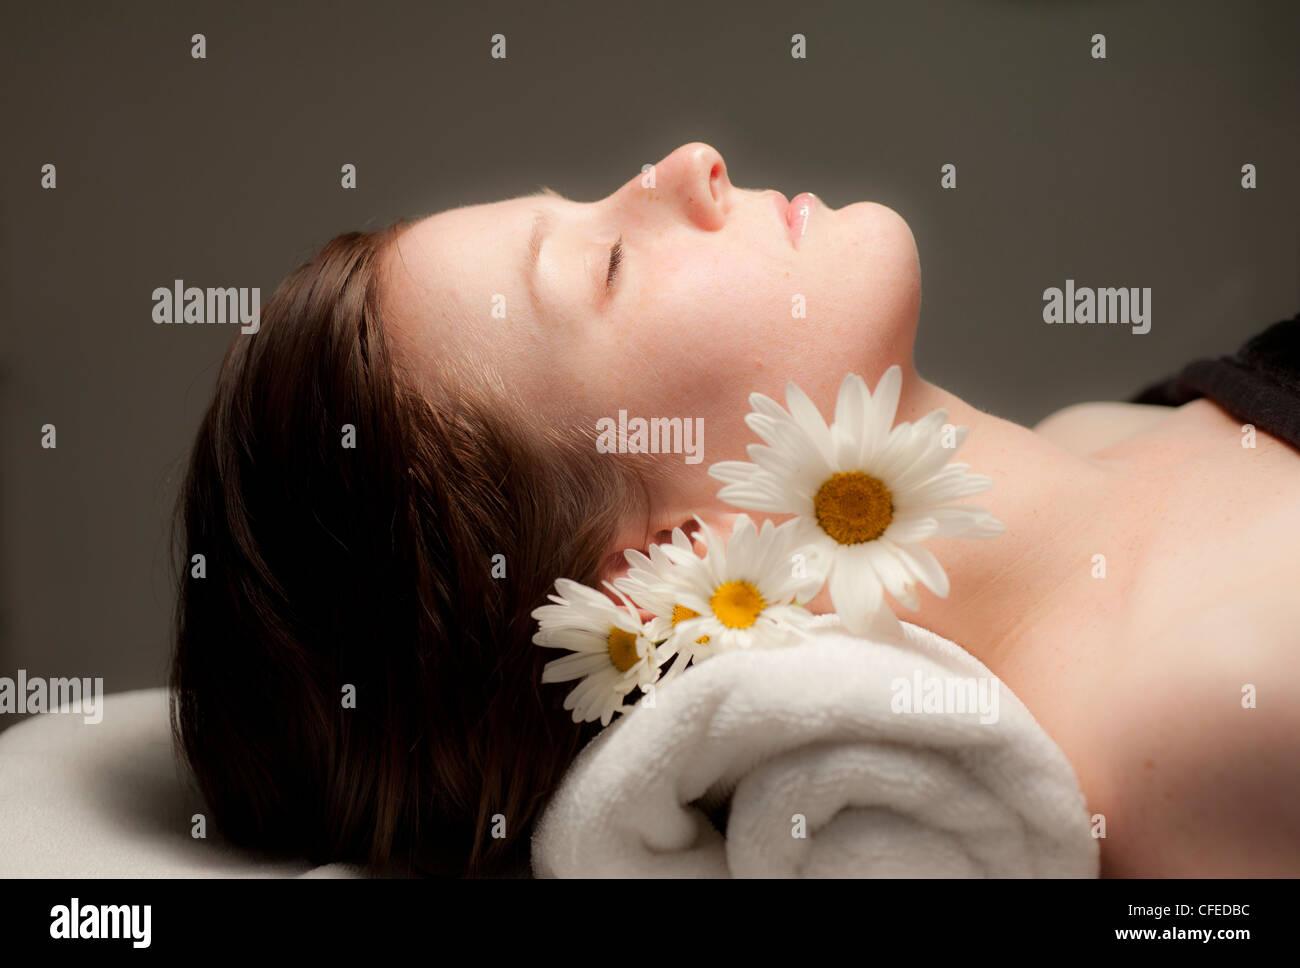 woman receiving facial at spa - Stock Image